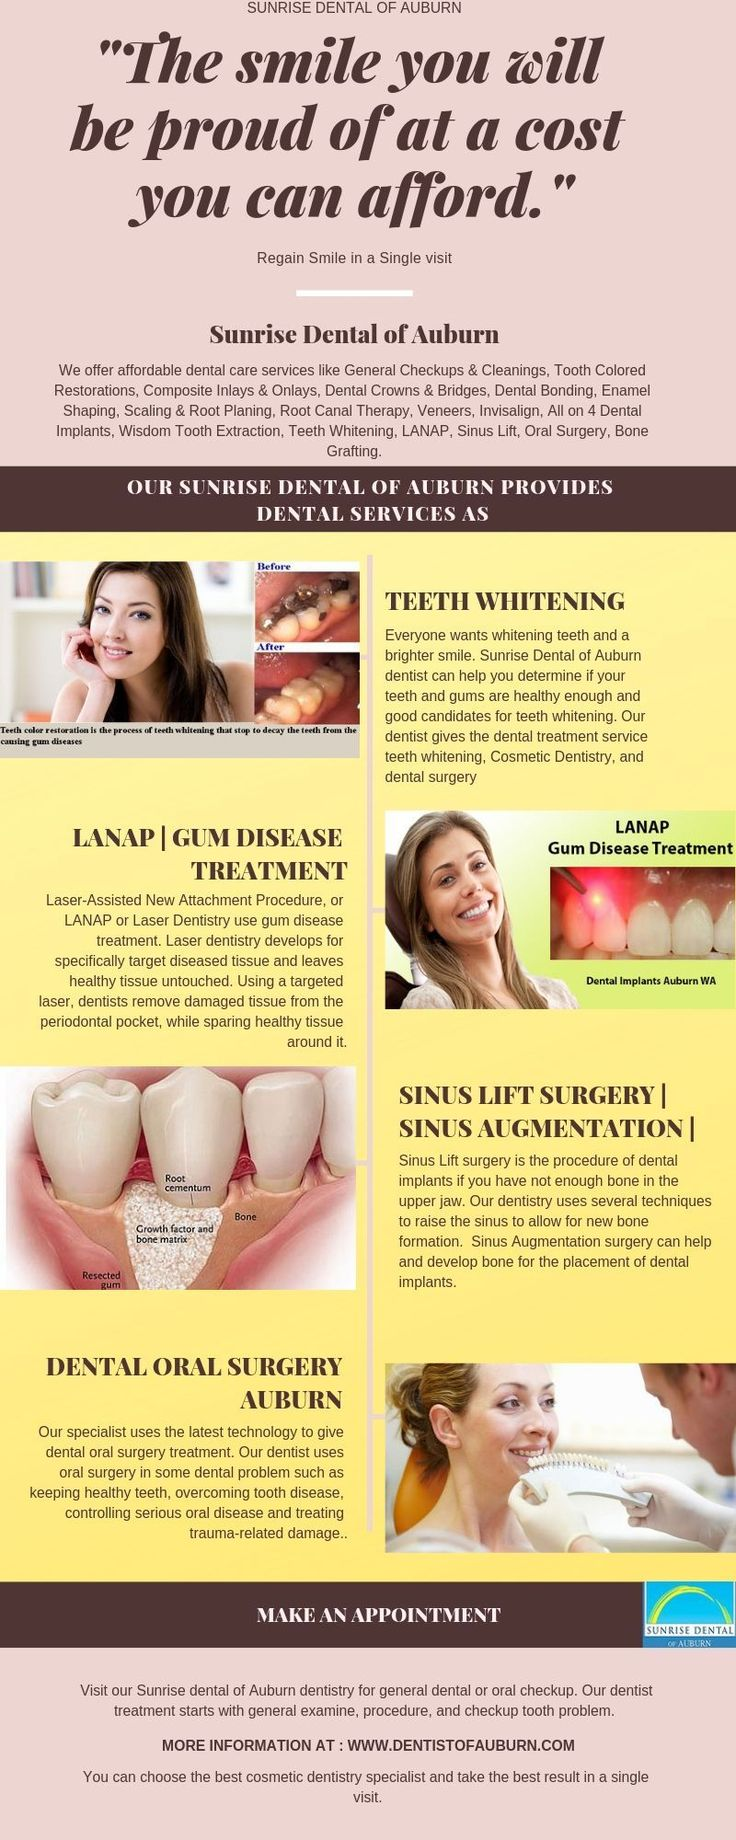 57 Dental Icons Butterscotch Sensitive teeth, Dental cover